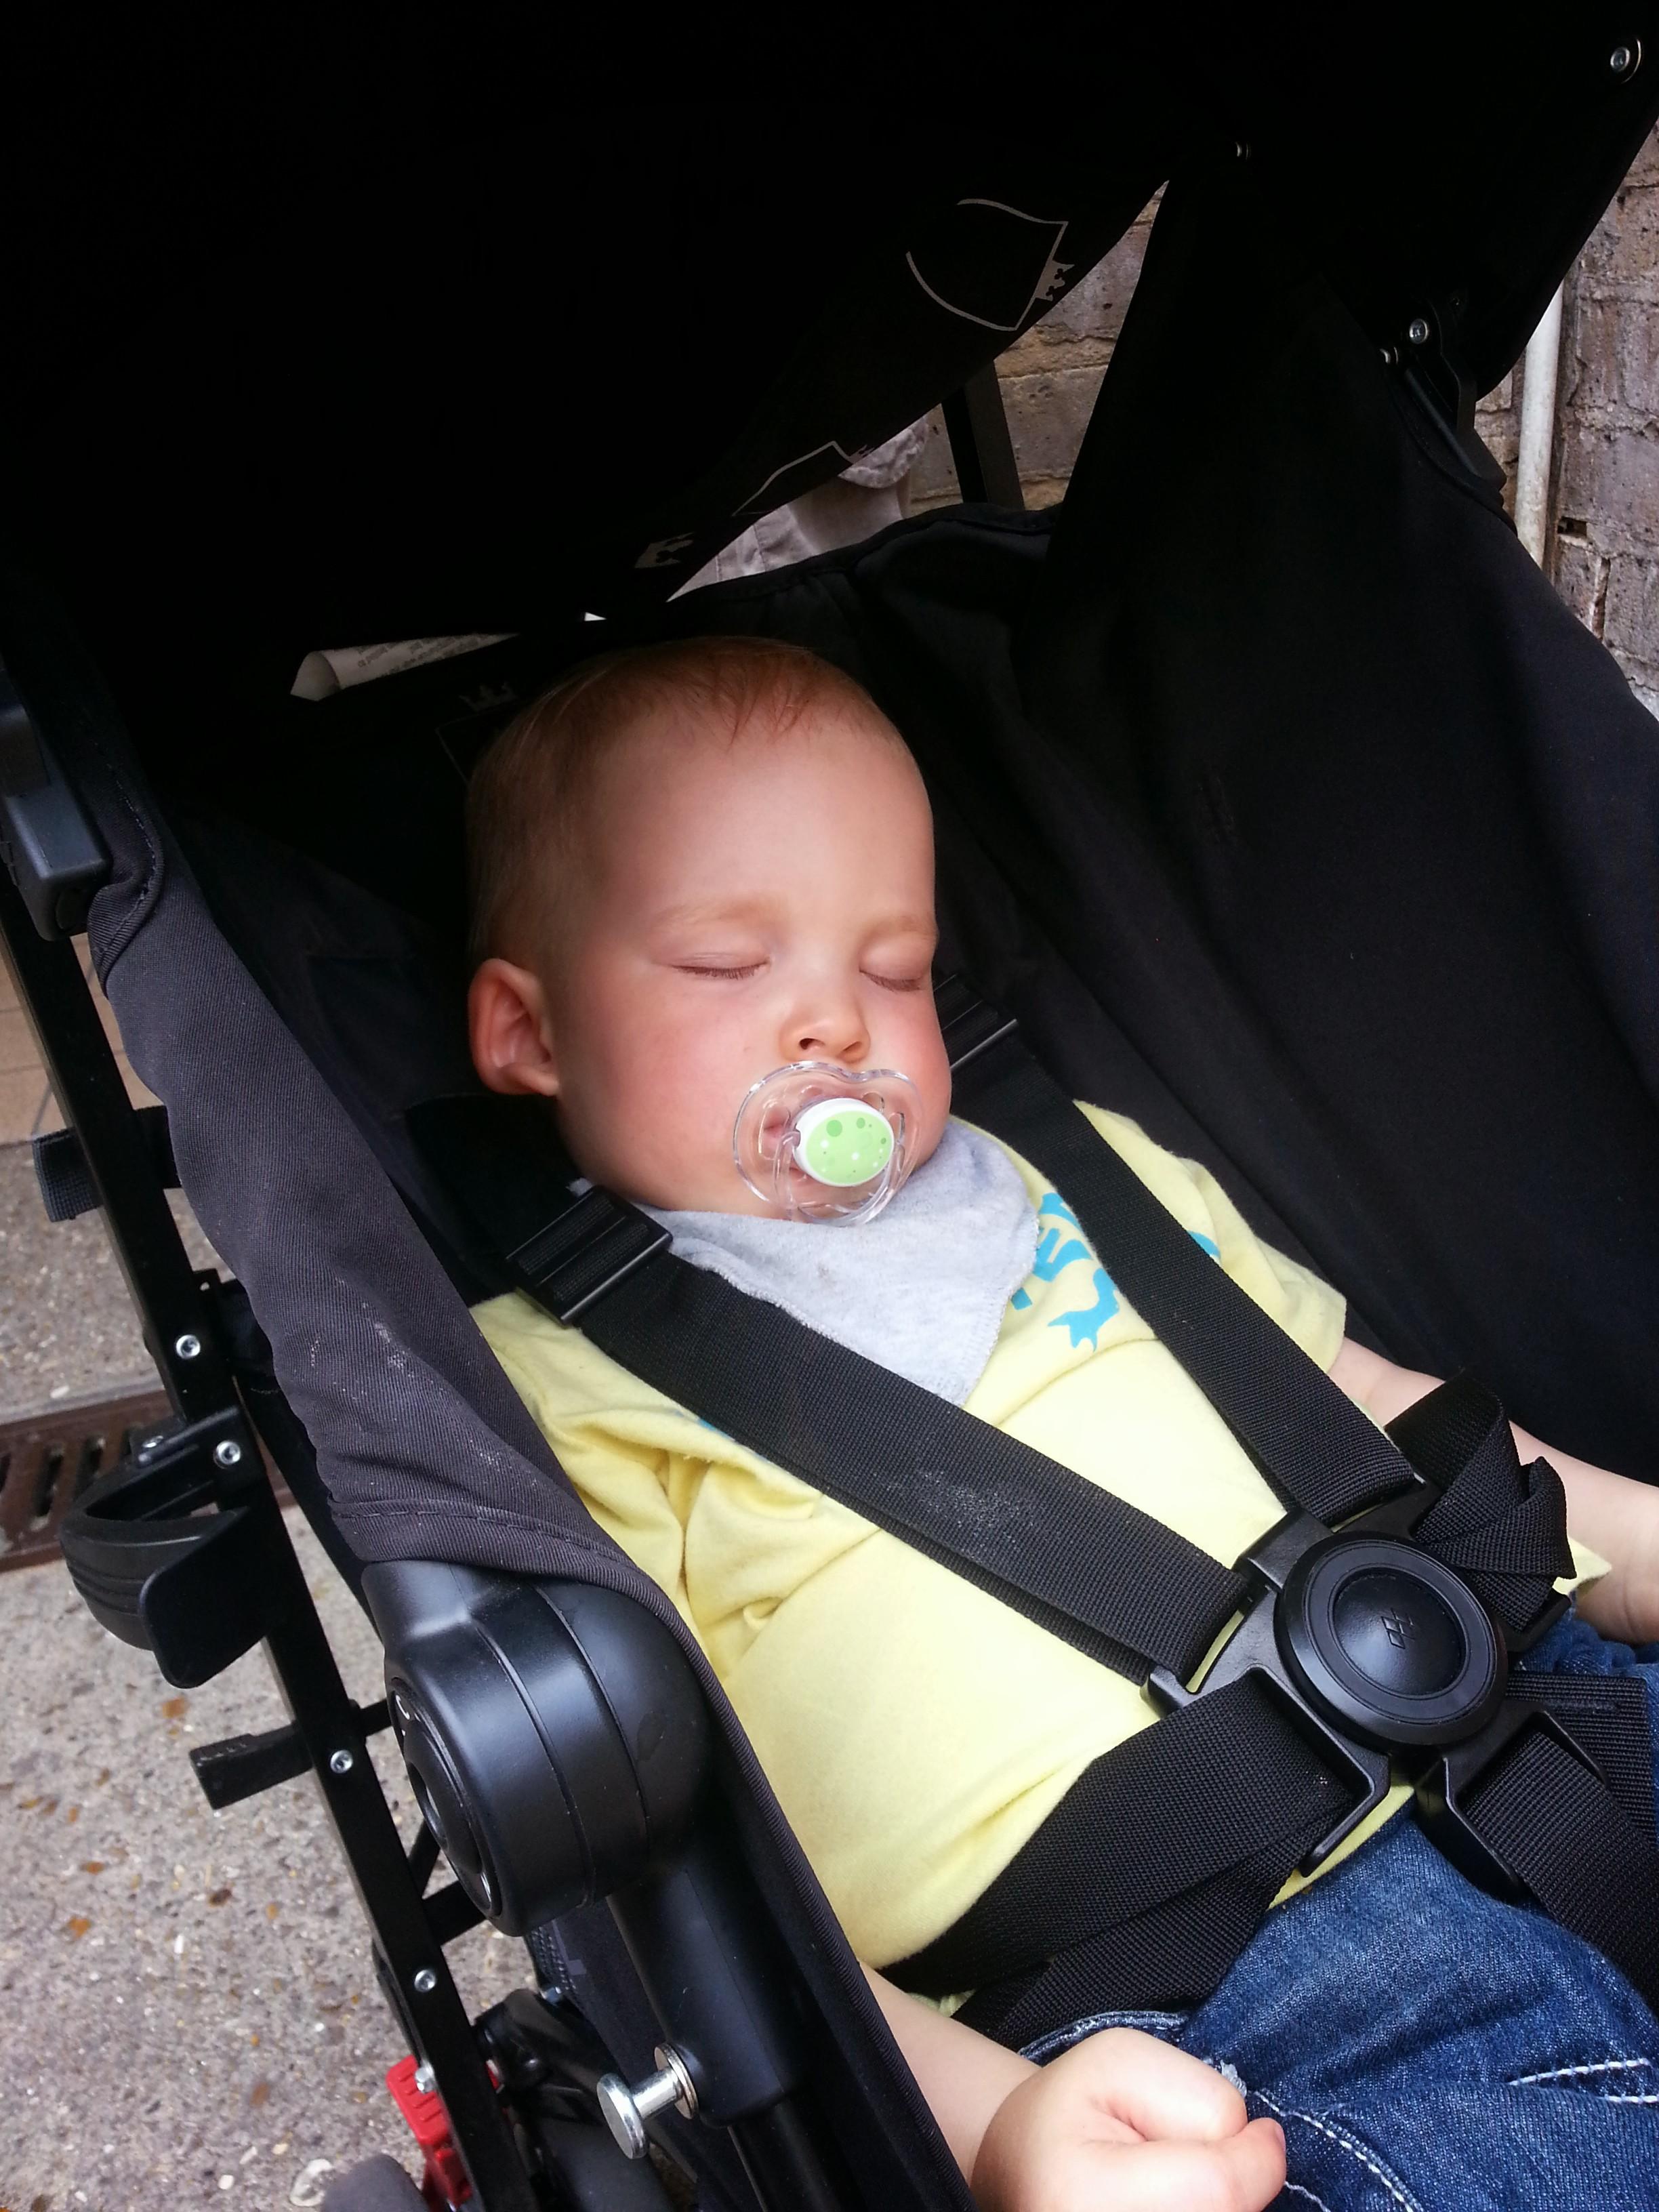 Shattered Baby J